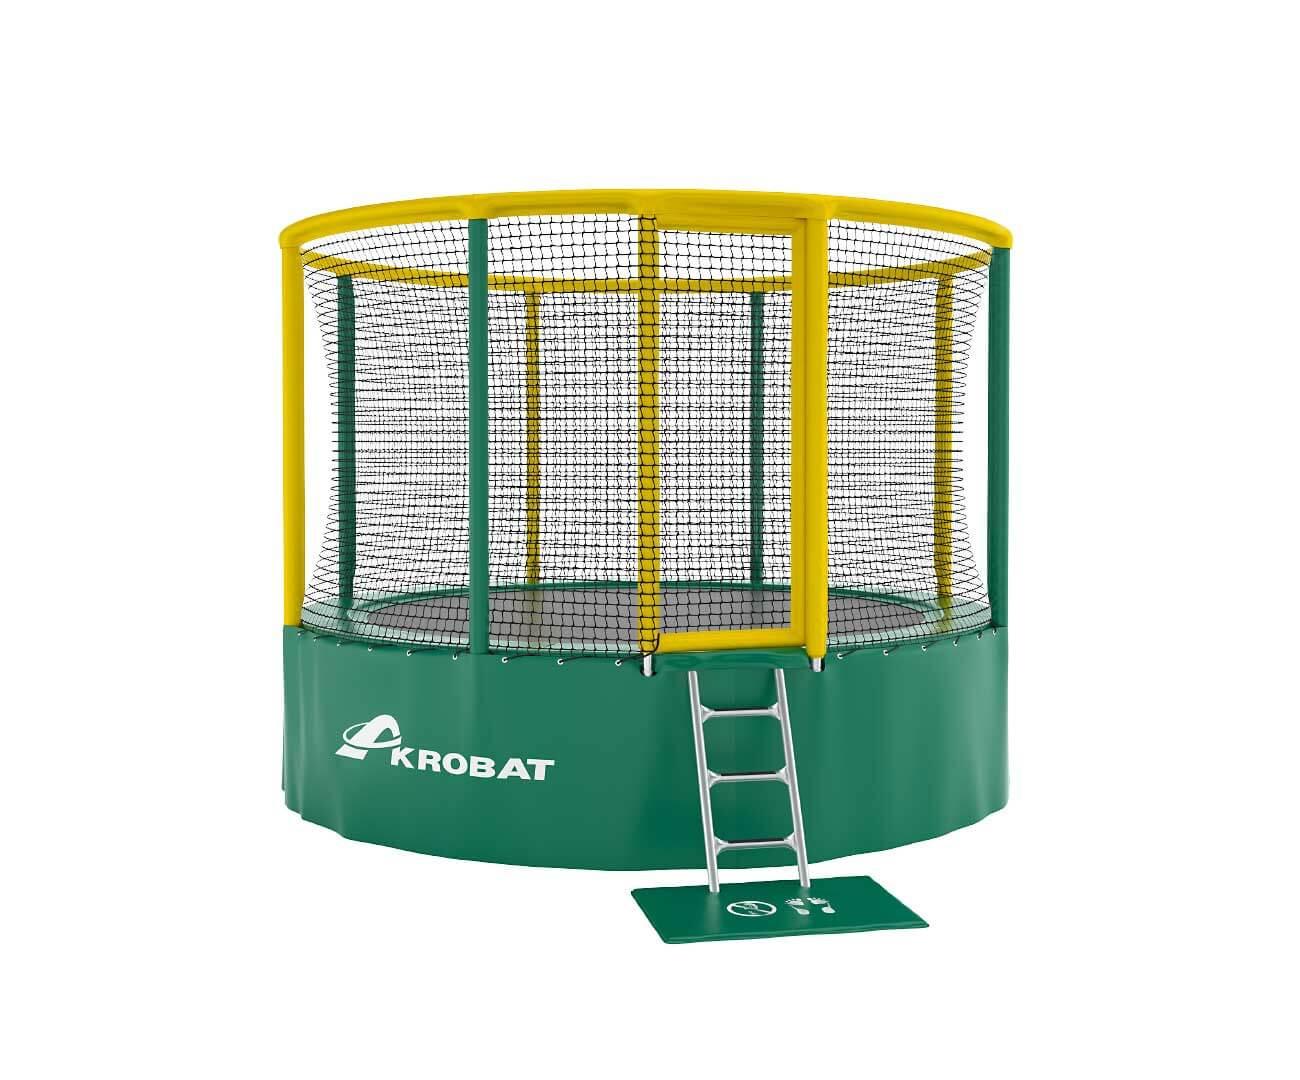 Akrobat Gallus 14 Green-yellow enclosure / Green safety pad /Black jumping mat